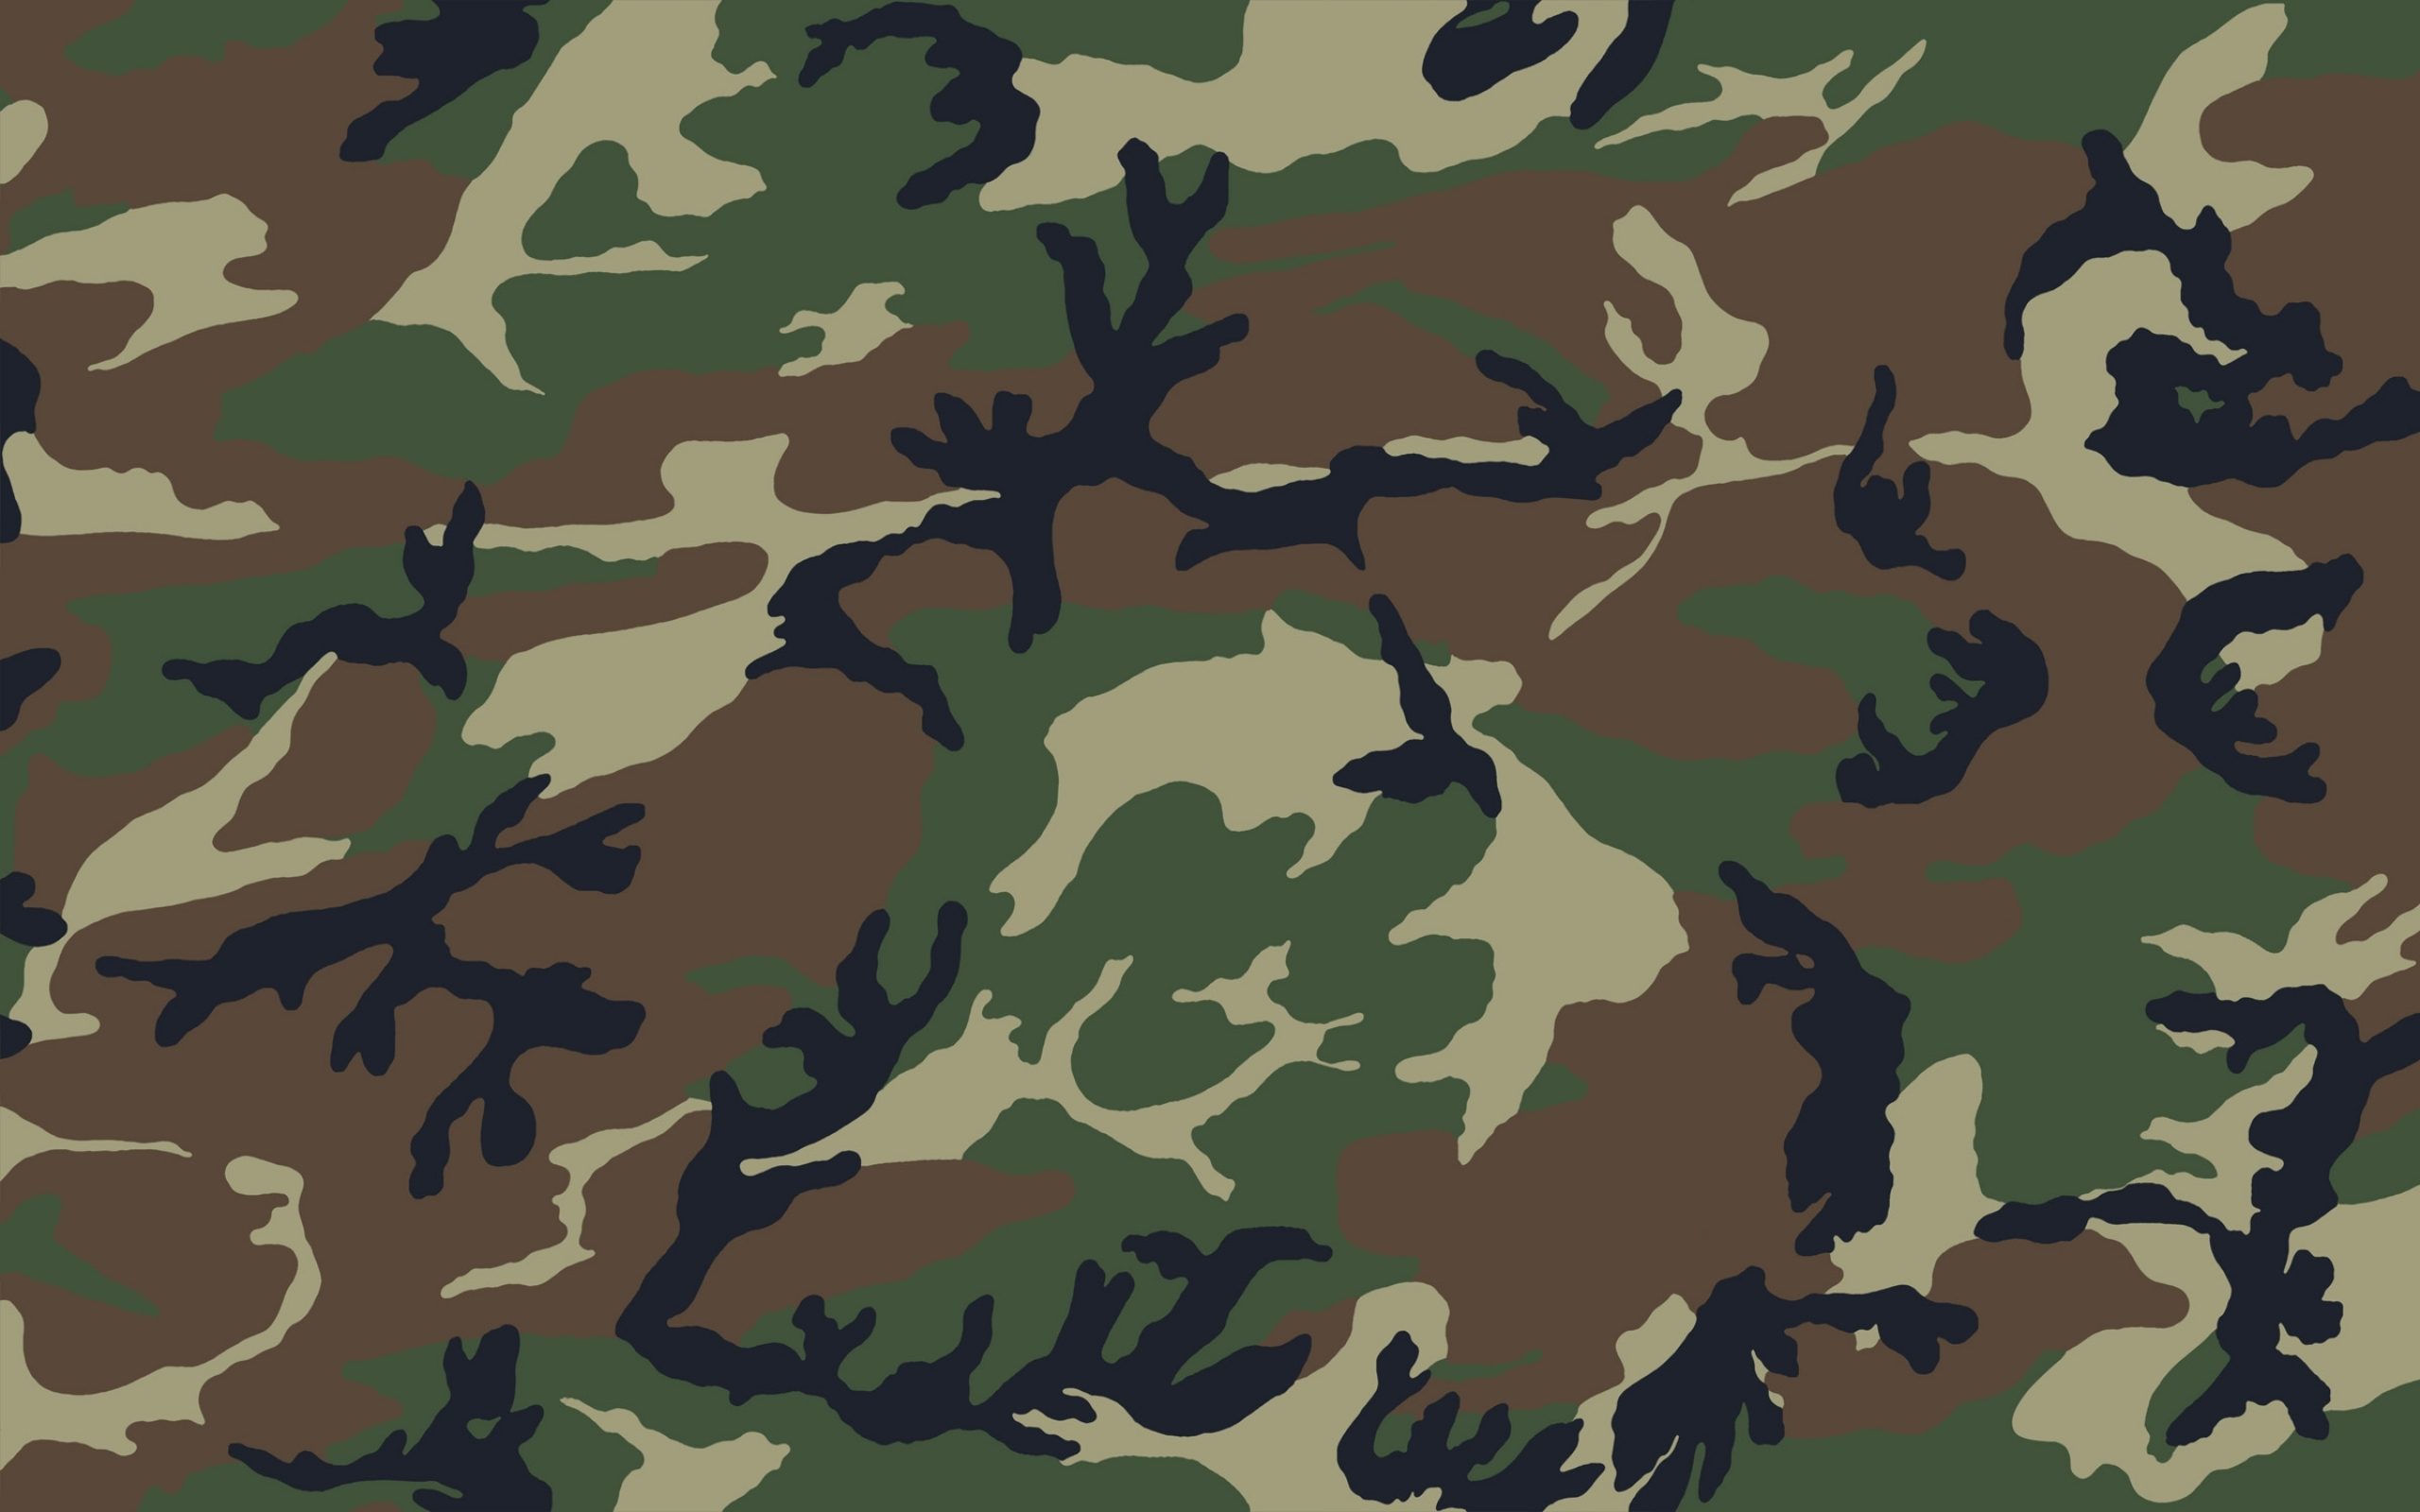 camouflage 3000x1500 wallpaper Wallpaper Wallpapers Download 2560x1600